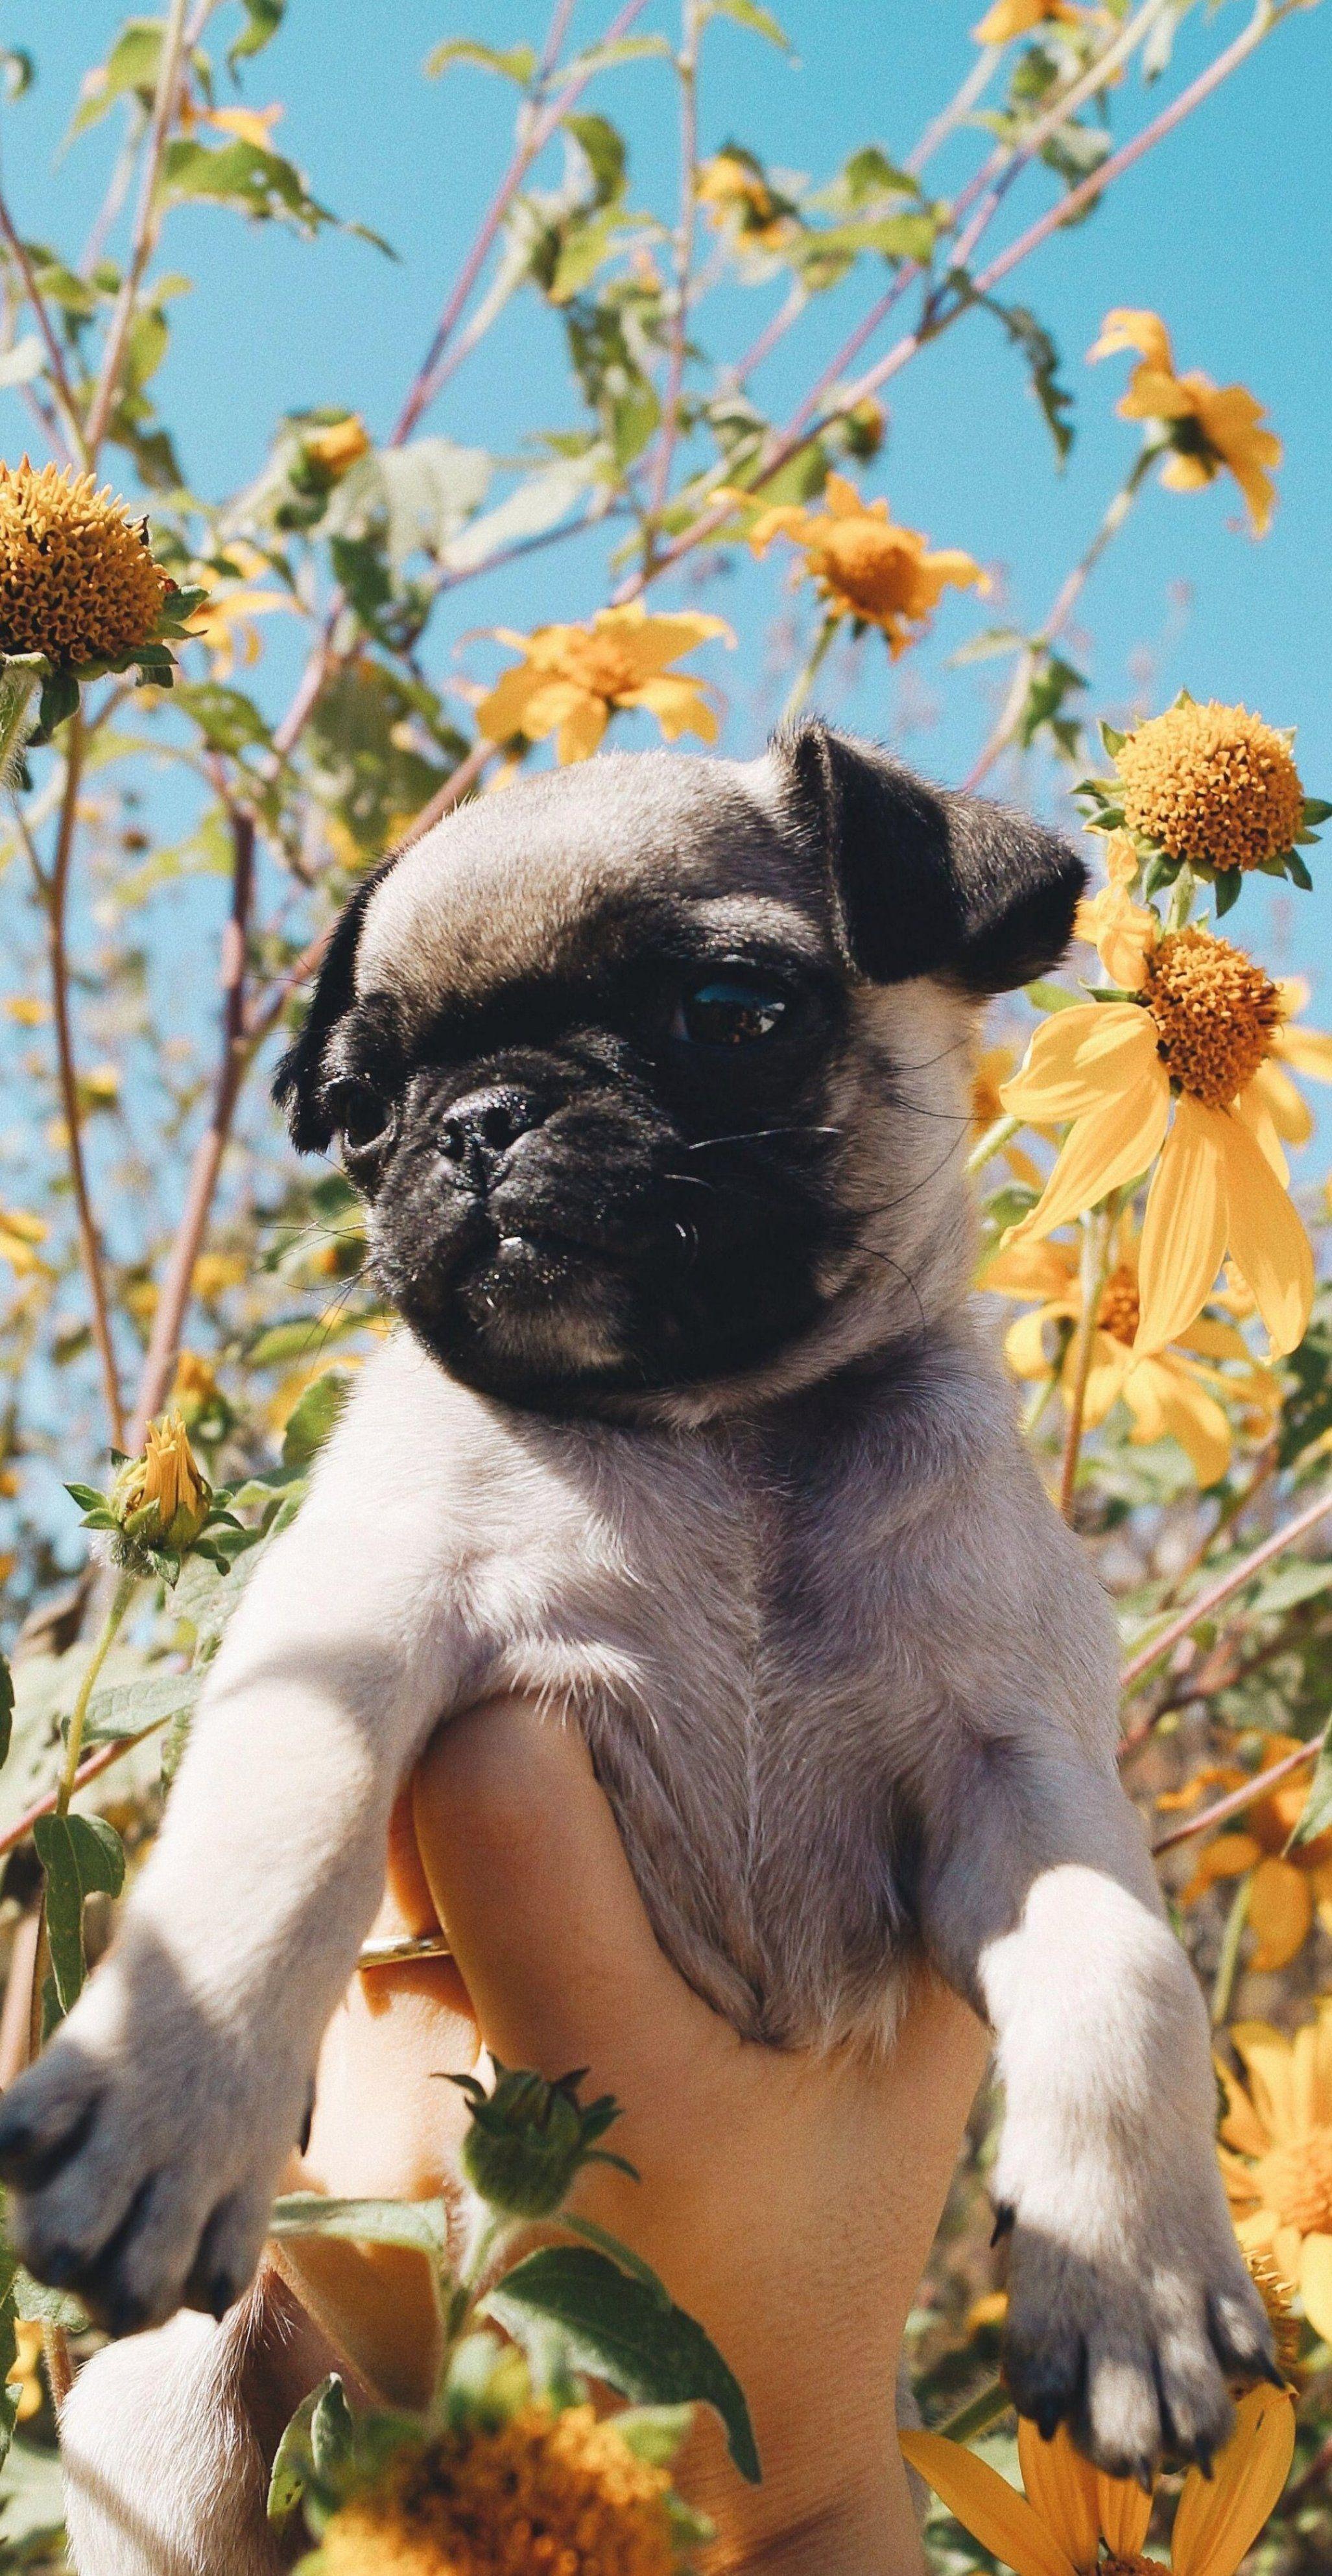 Pin By Amanda Cerutti On Pug Wallpaper Screensaver Baby Pugs Cute Pug Puppies Cute Pugs